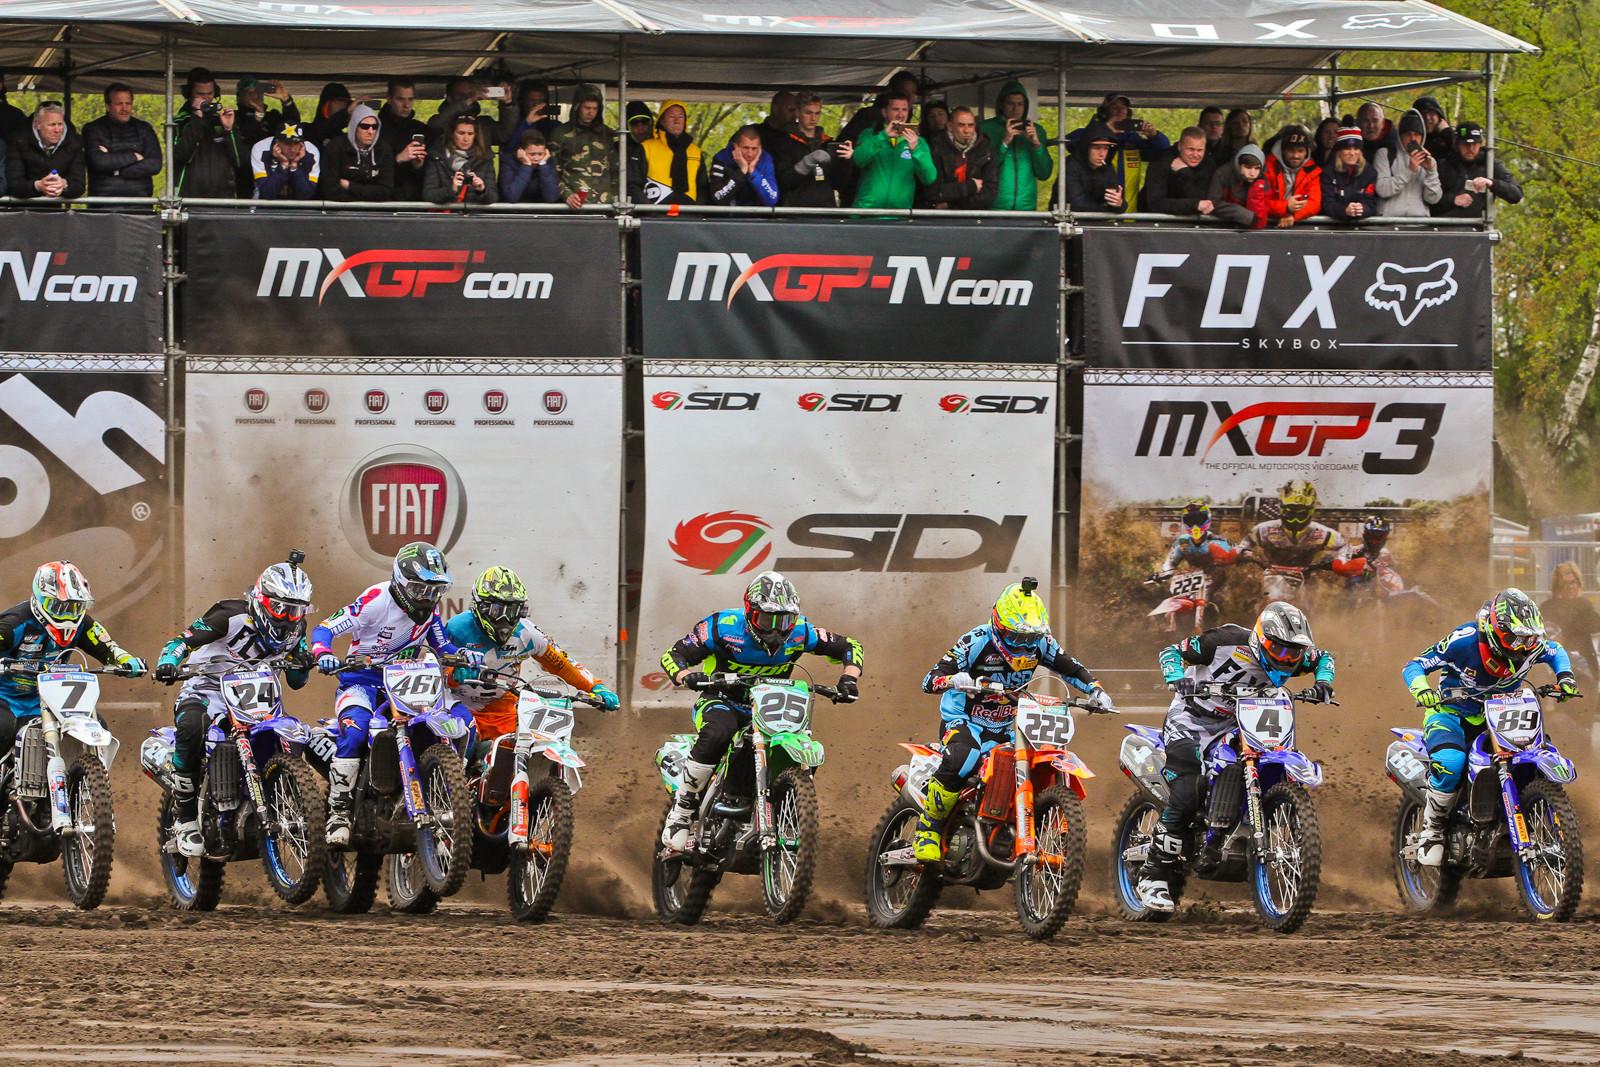 MXGP Start - Photo Blast: 2017 MXGP of Valkenswaard - Motocross Pictures - Vital MX